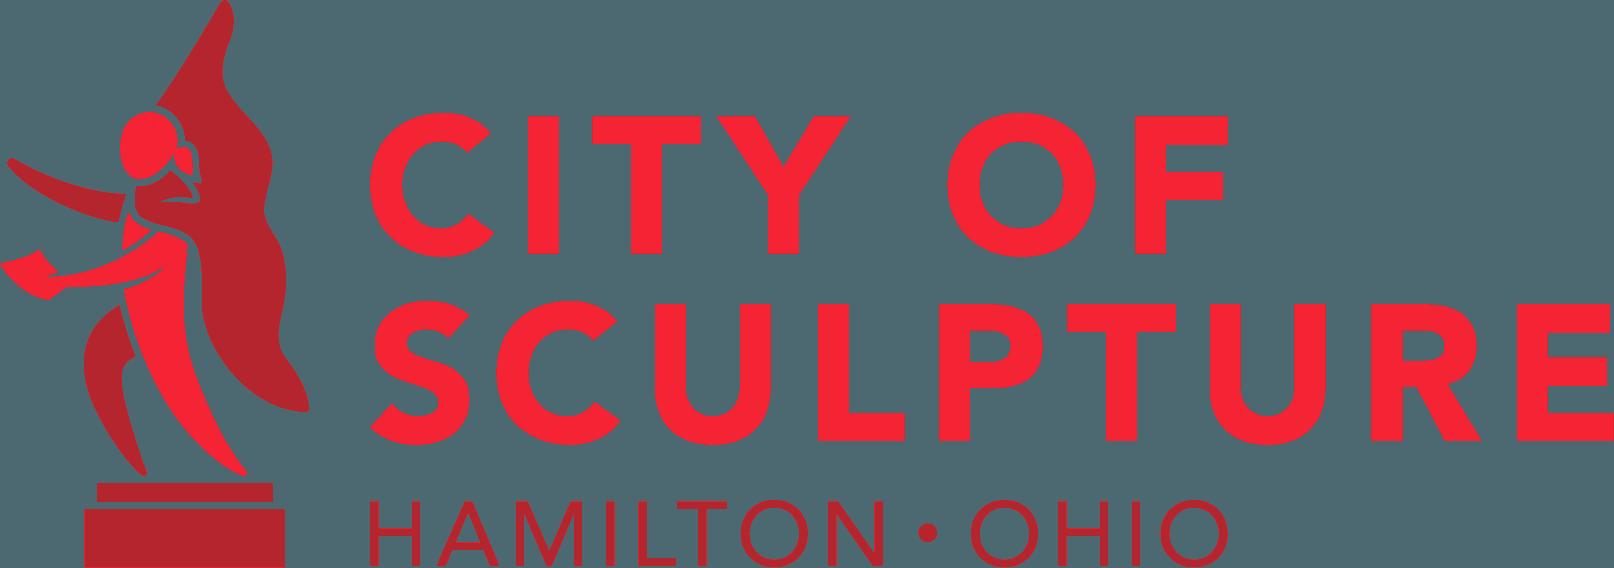 hamilton ohio city of sculpture